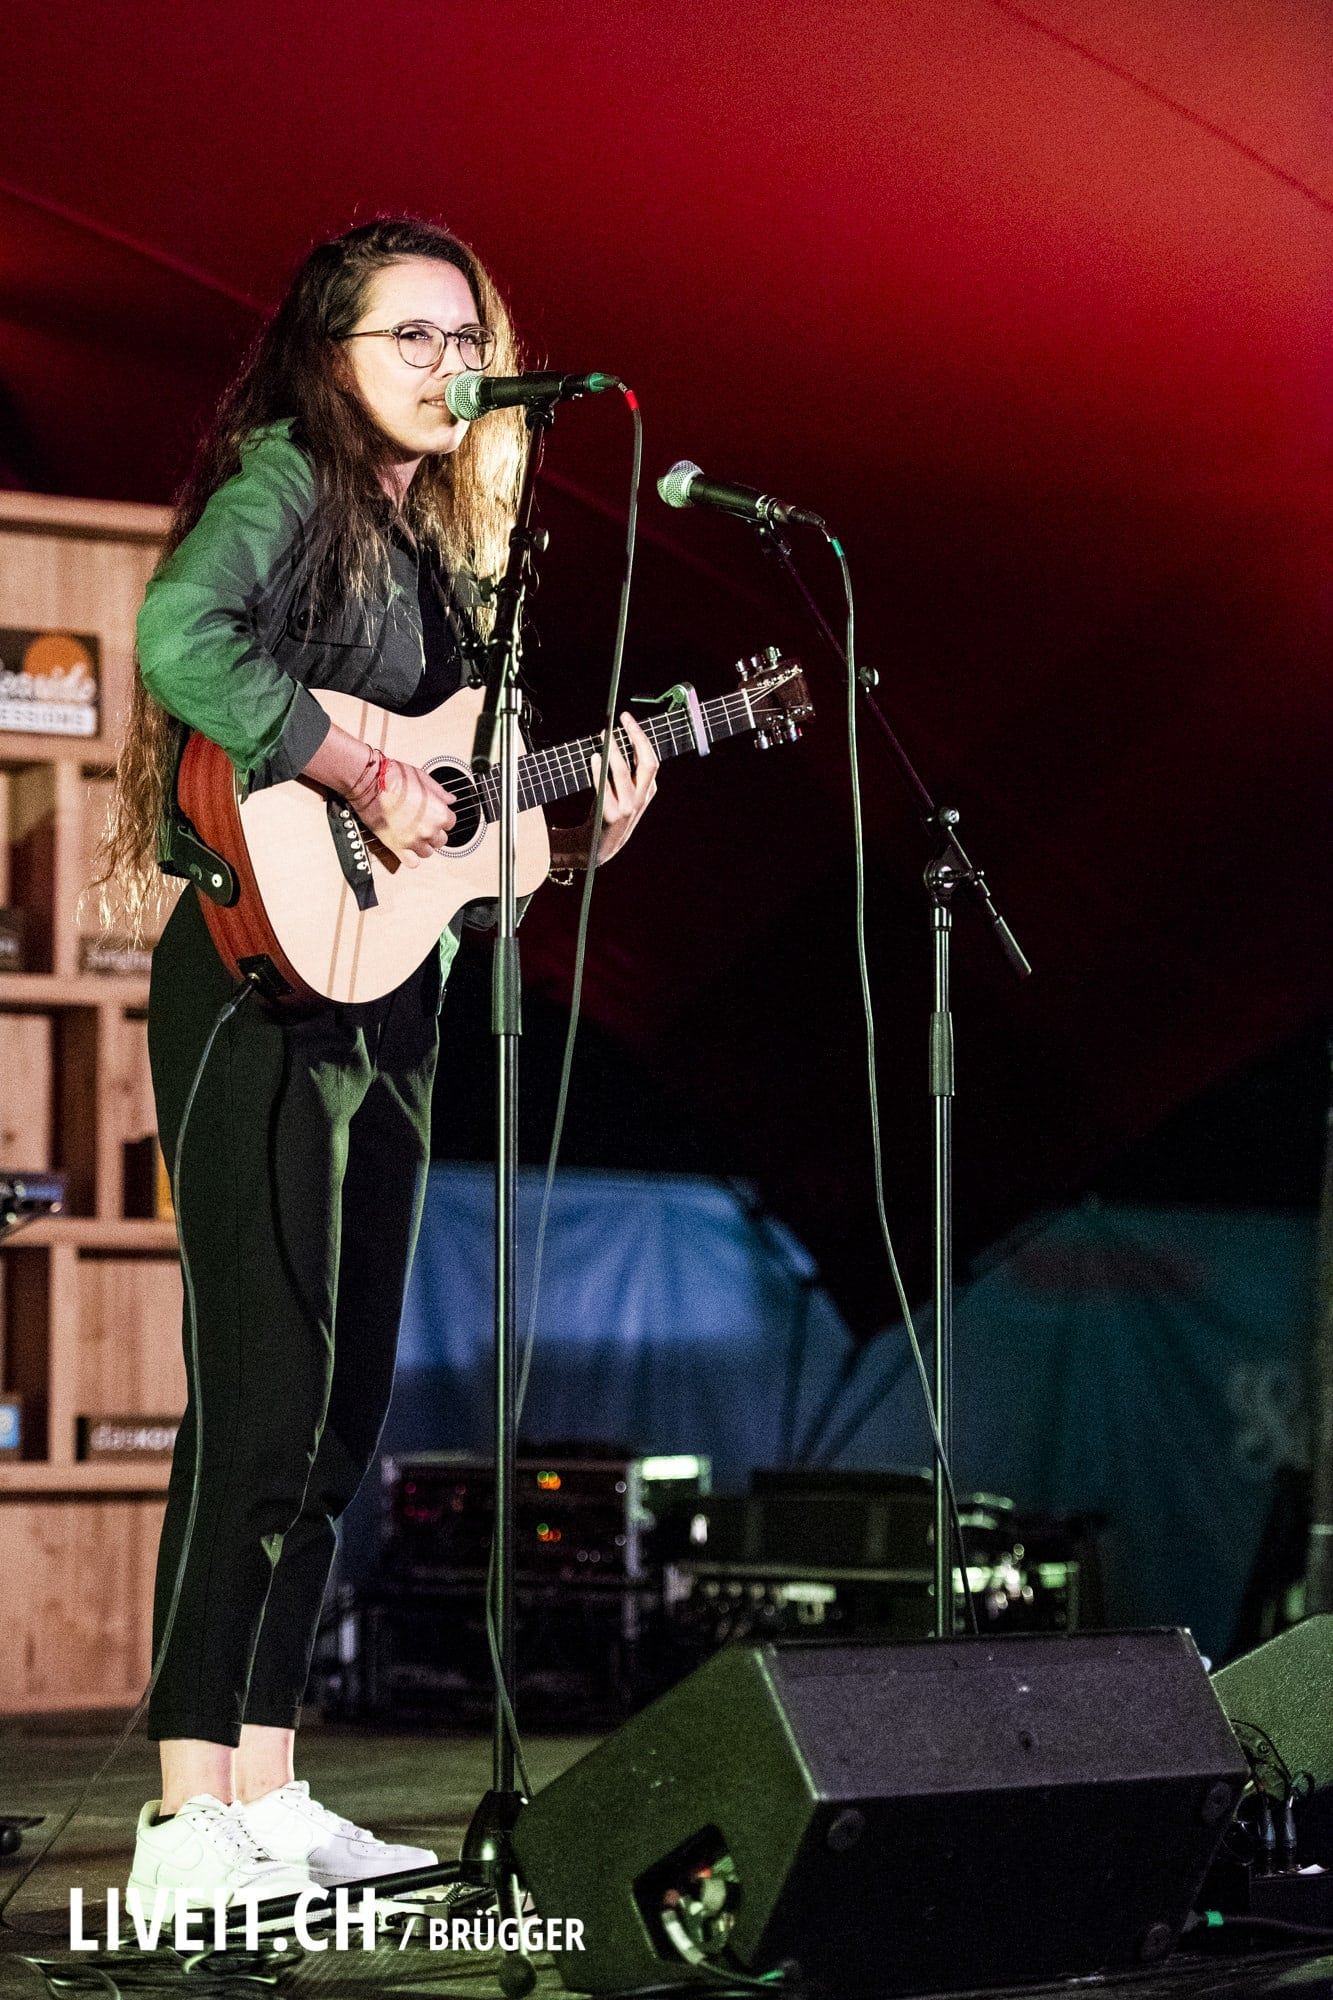 Veronica Fusaro fotografiert am Seaside Festival 2018. (Dominic Bruegger for liveit.ch)